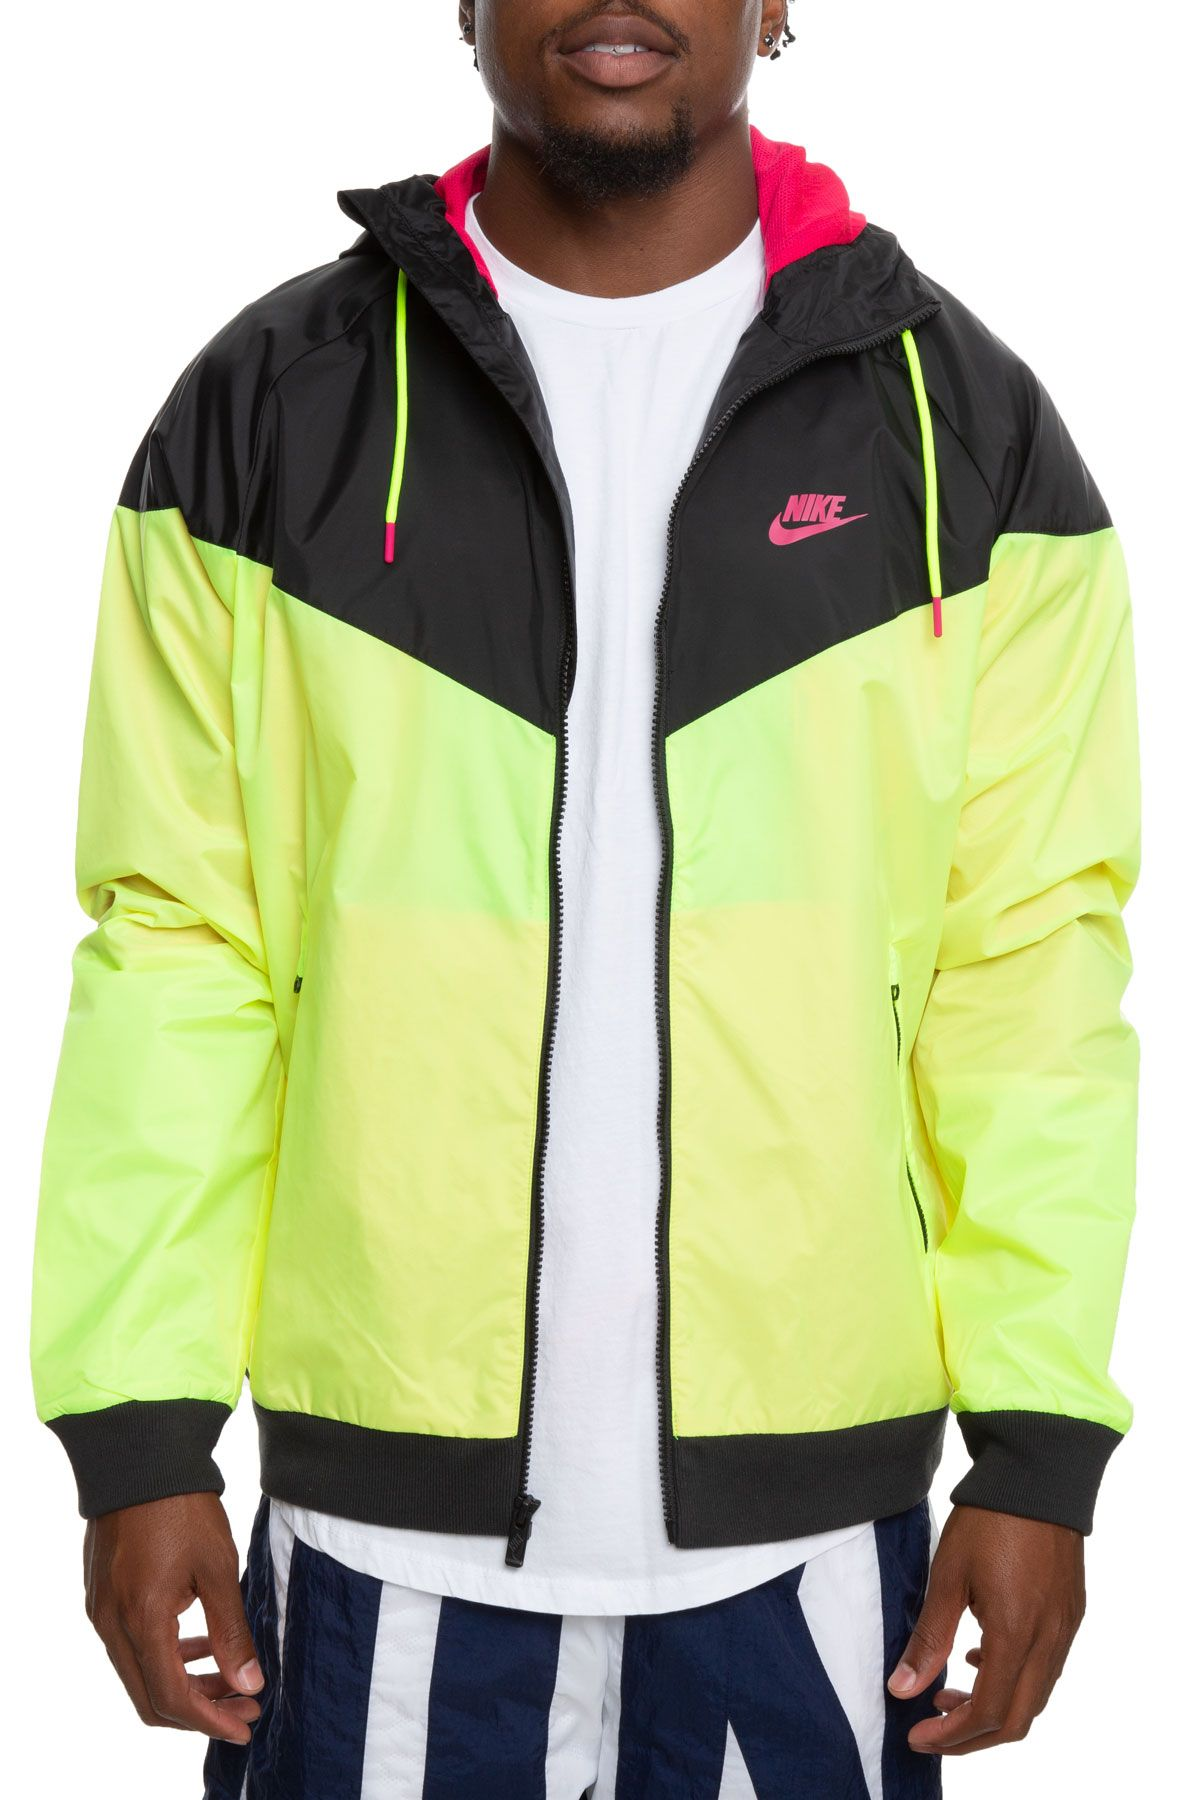 Nike Sportswear Windrunner Jacket, AnthraciteBarely Volt, Large